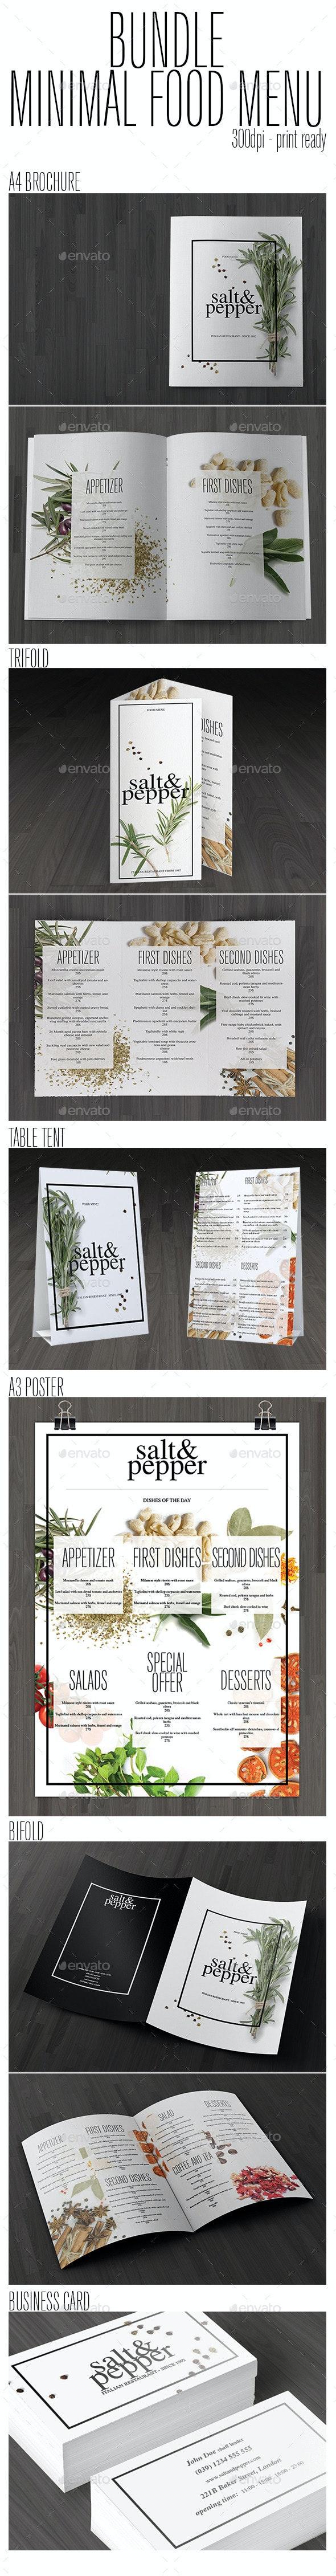 Bundle Minimal Food Menu - Food Menus Print Templates